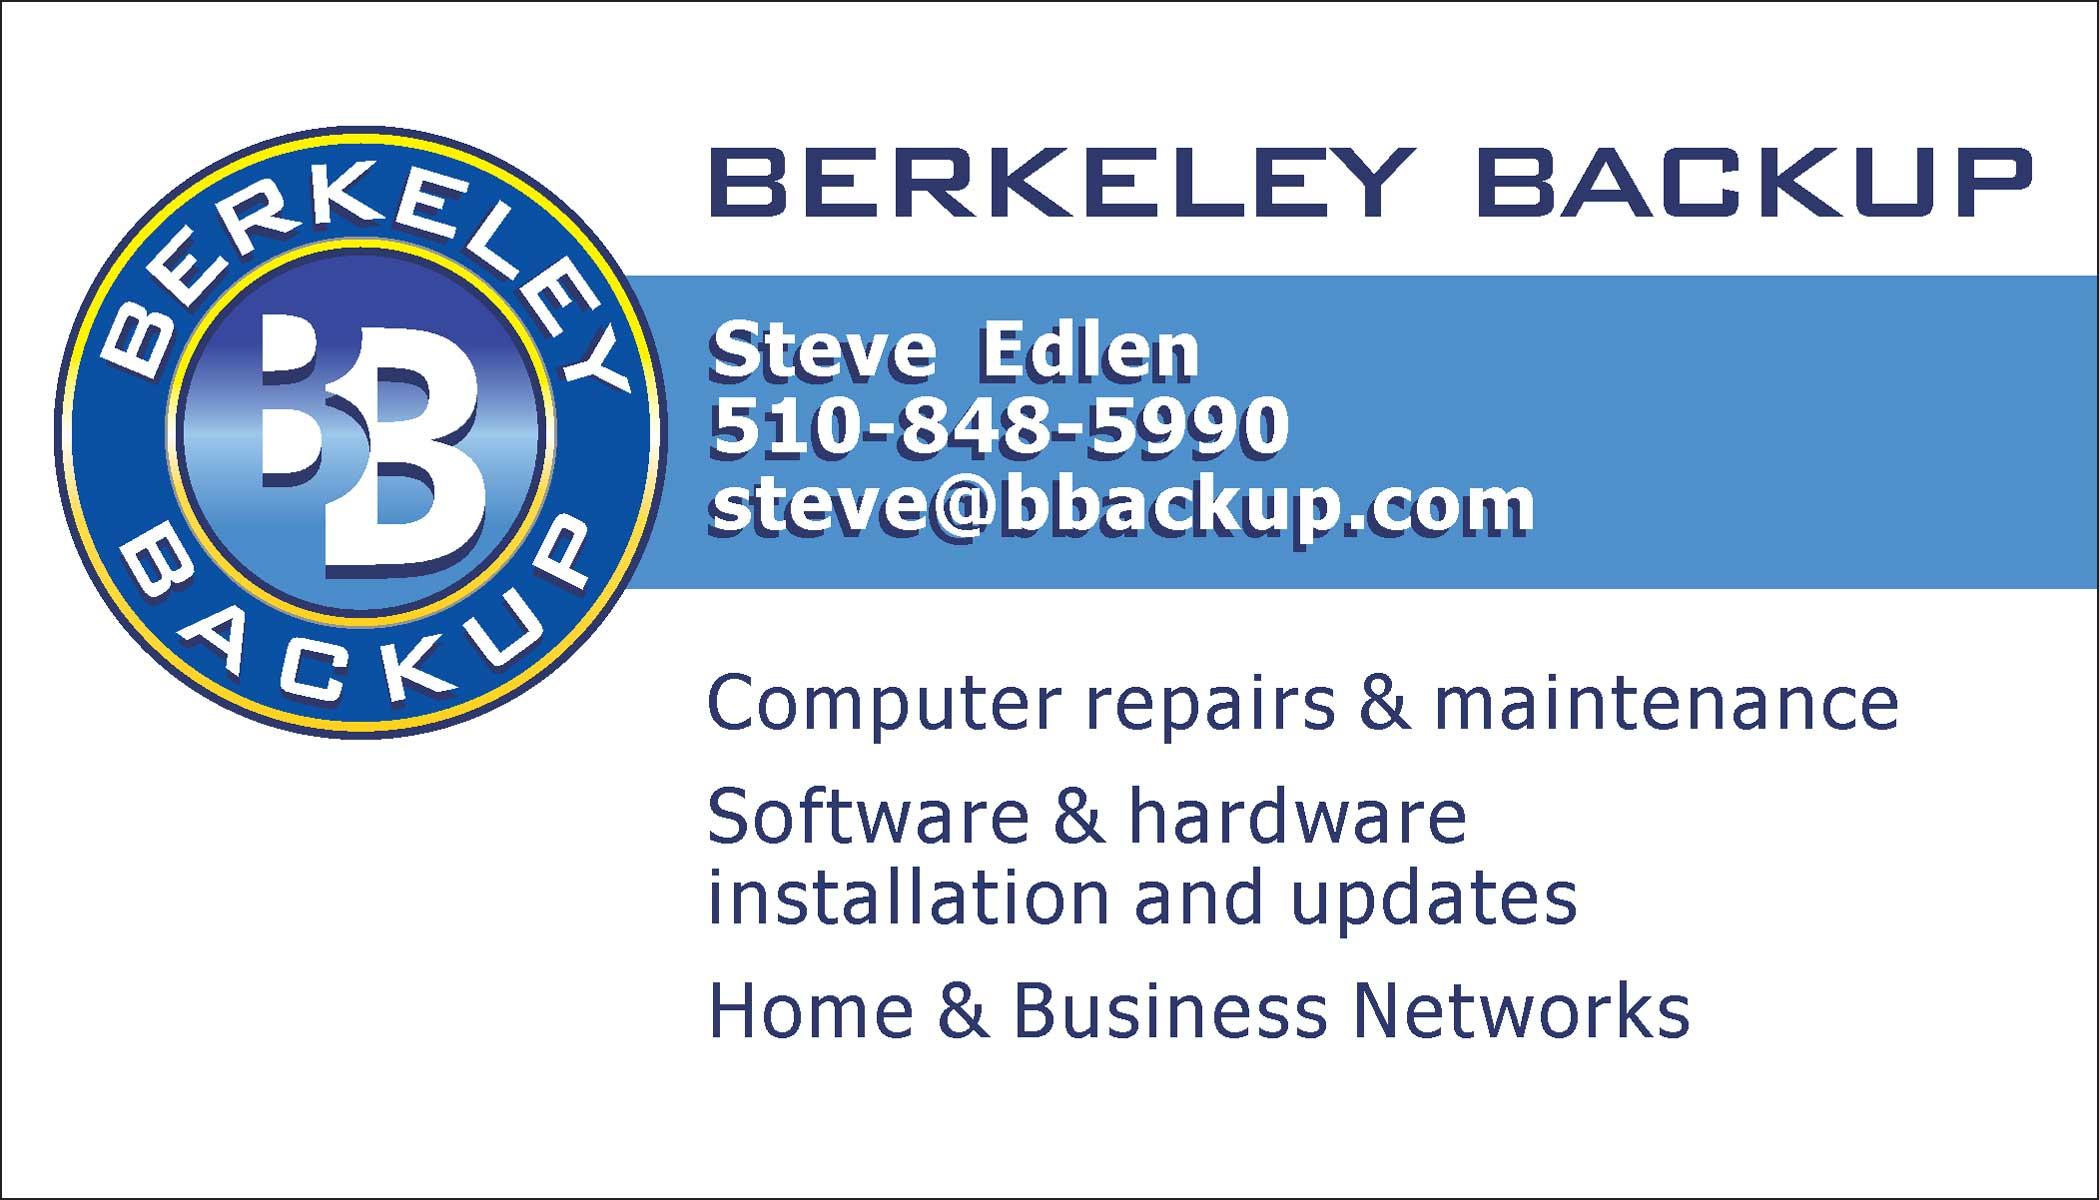 Berkeley backup logo business card alternative stuart nezin design view larger image berkeley backup business card reheart Choice Image